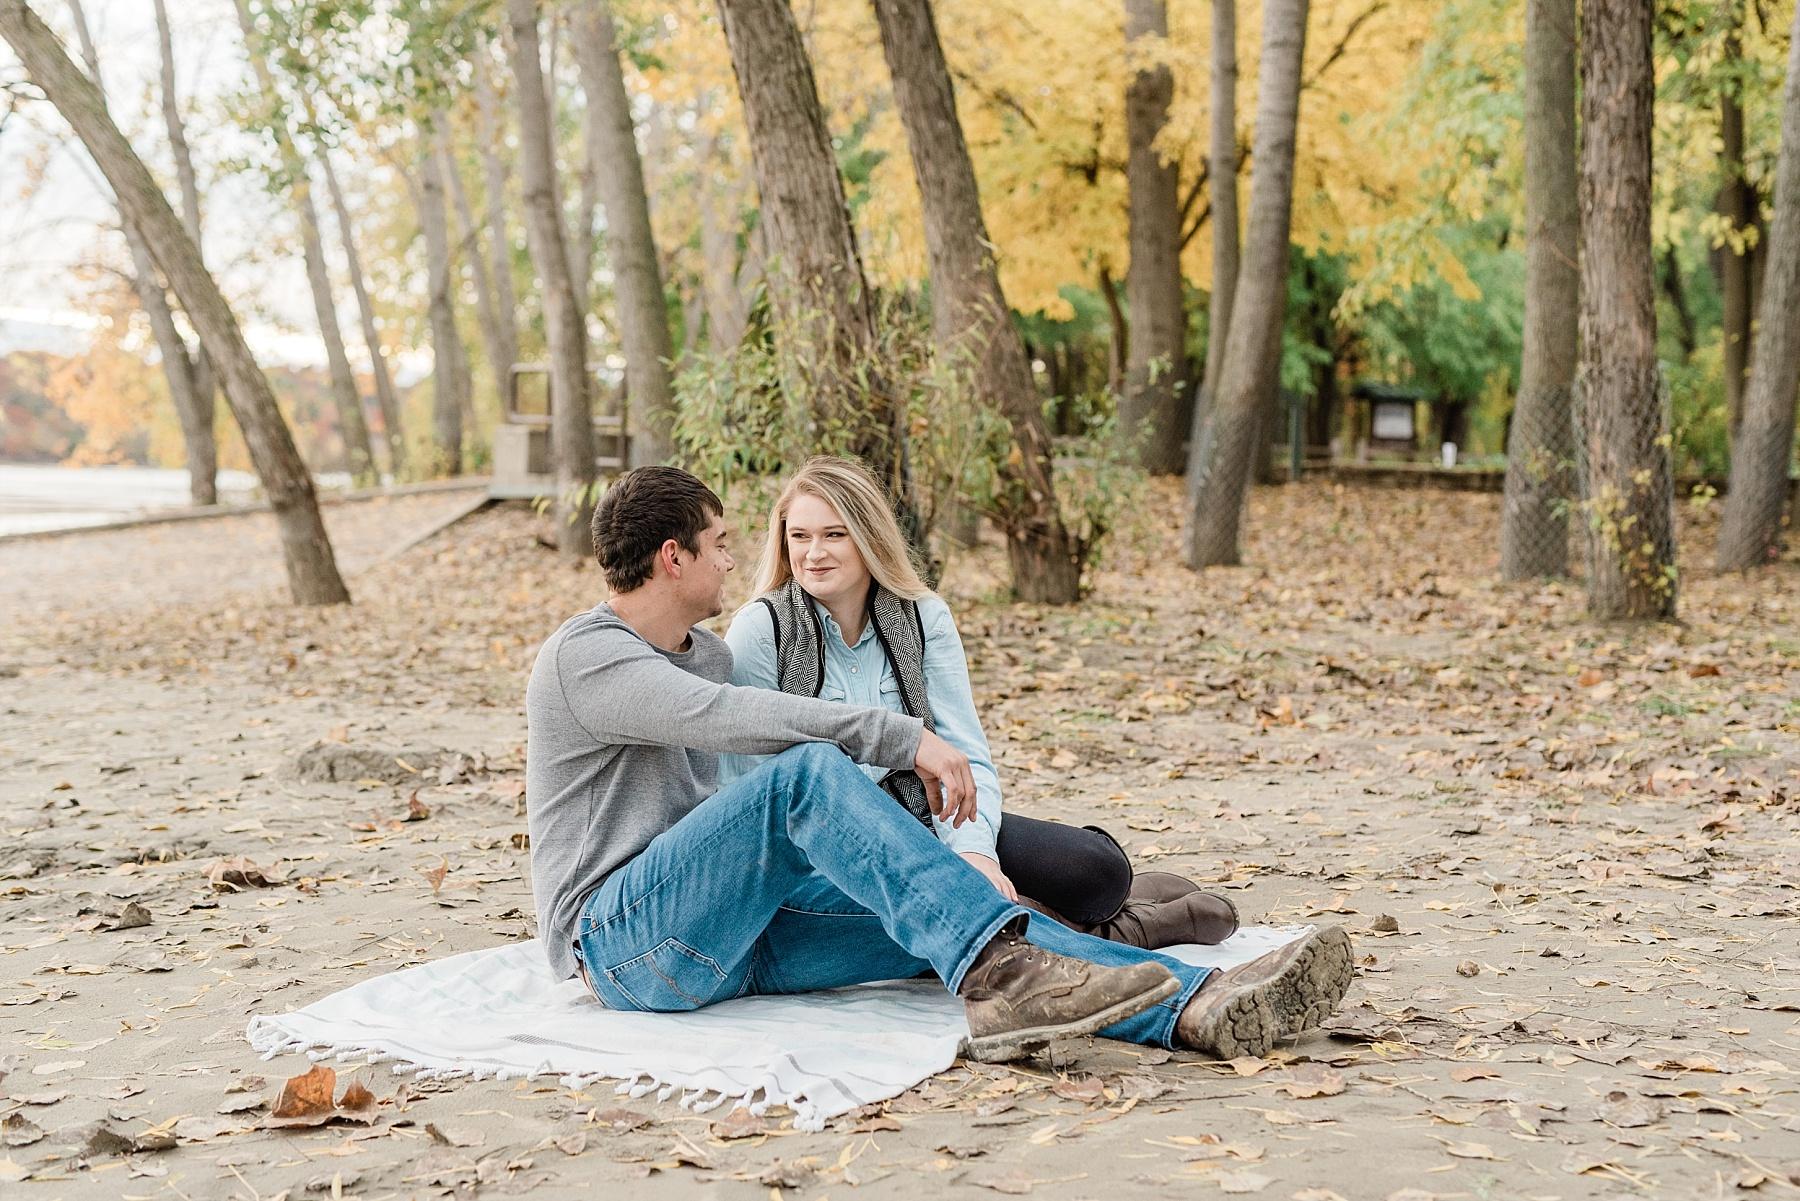 Fall Couples Session on Shore of Missouri River by Kelsi Kliethermes Photography Kansas City Missouri Wedding Photographer_0004.jpg